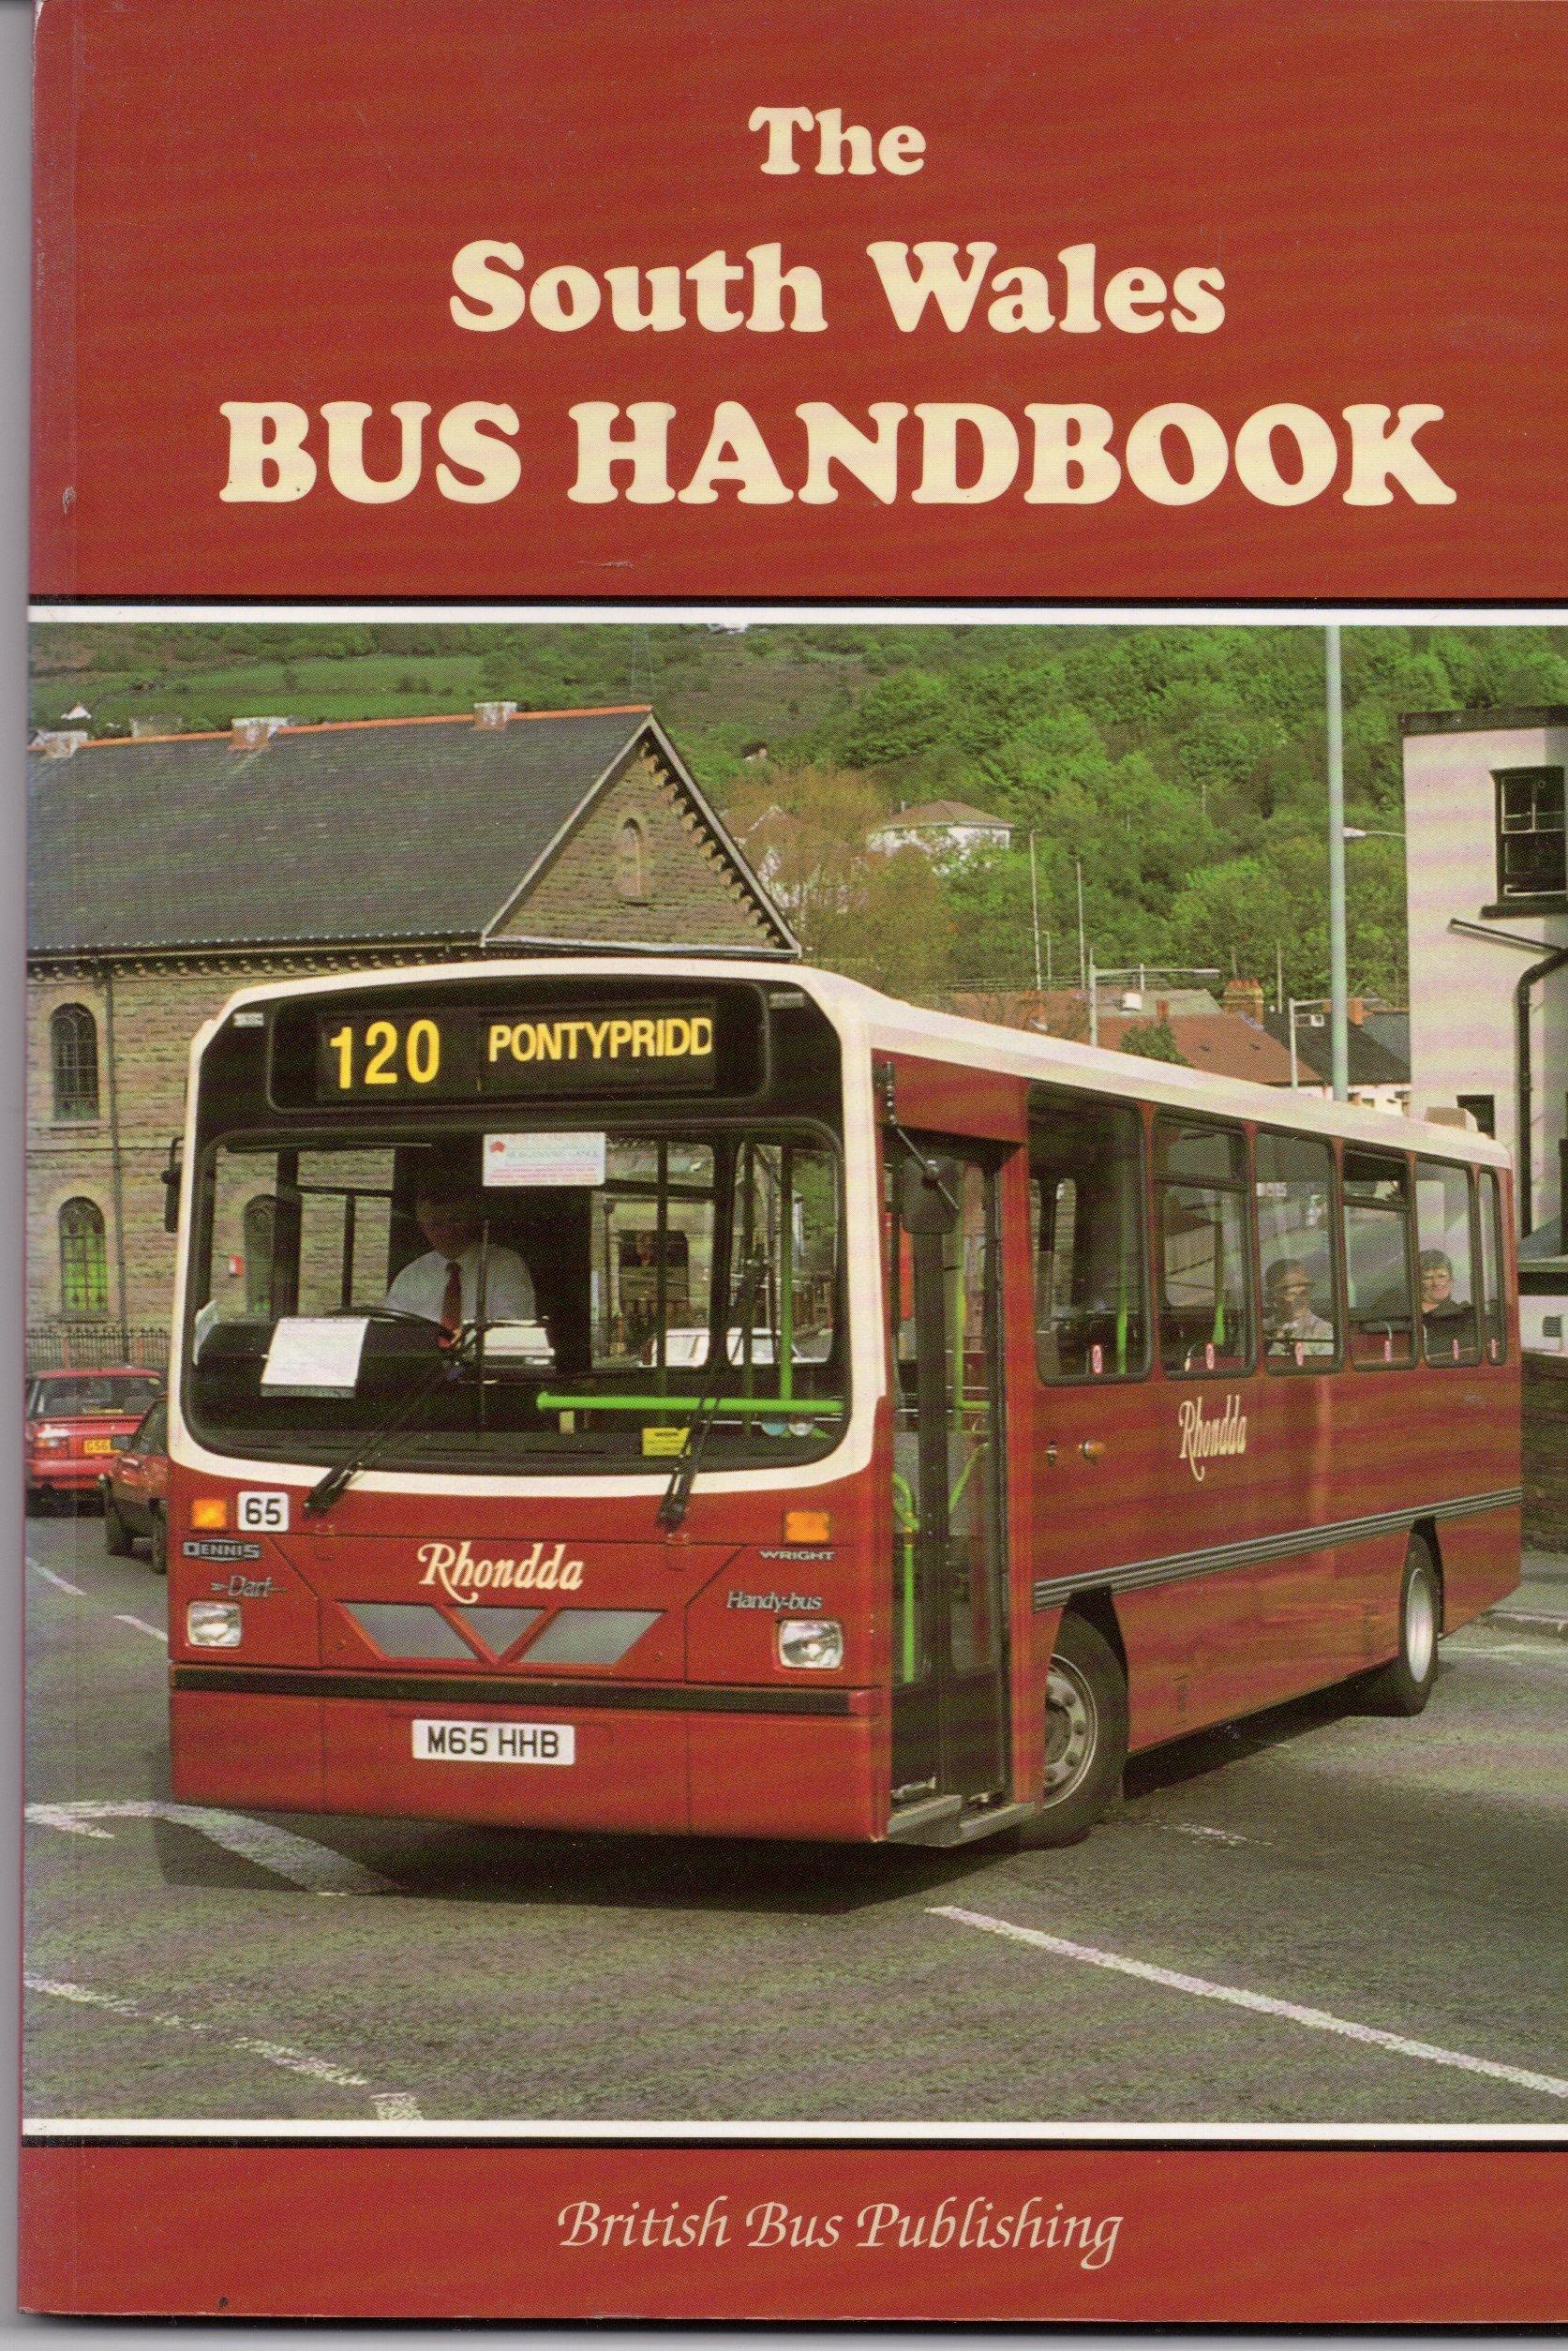 The South Wales Bus Handbook: WS96 (Bus Handbooks)